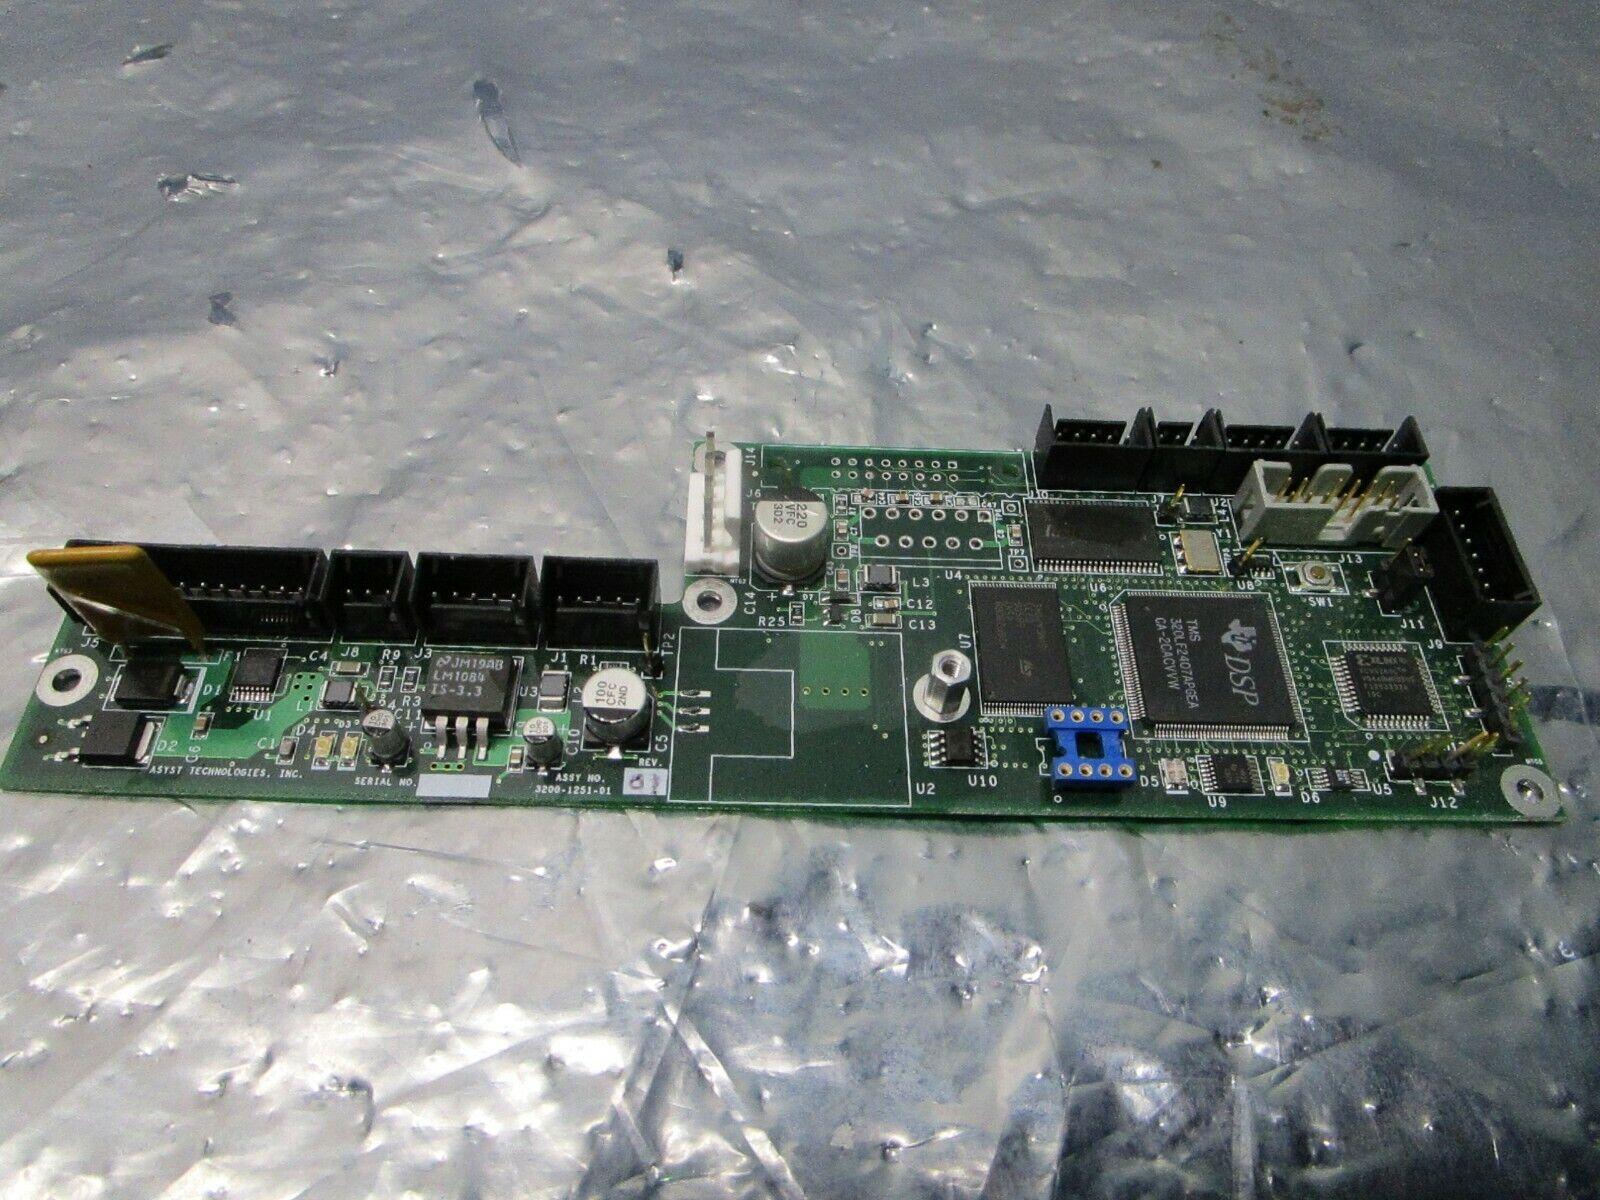 Asyst 3200-1251-01 Door Controller Board, PCB, FAB 3000-1251-01, 101182